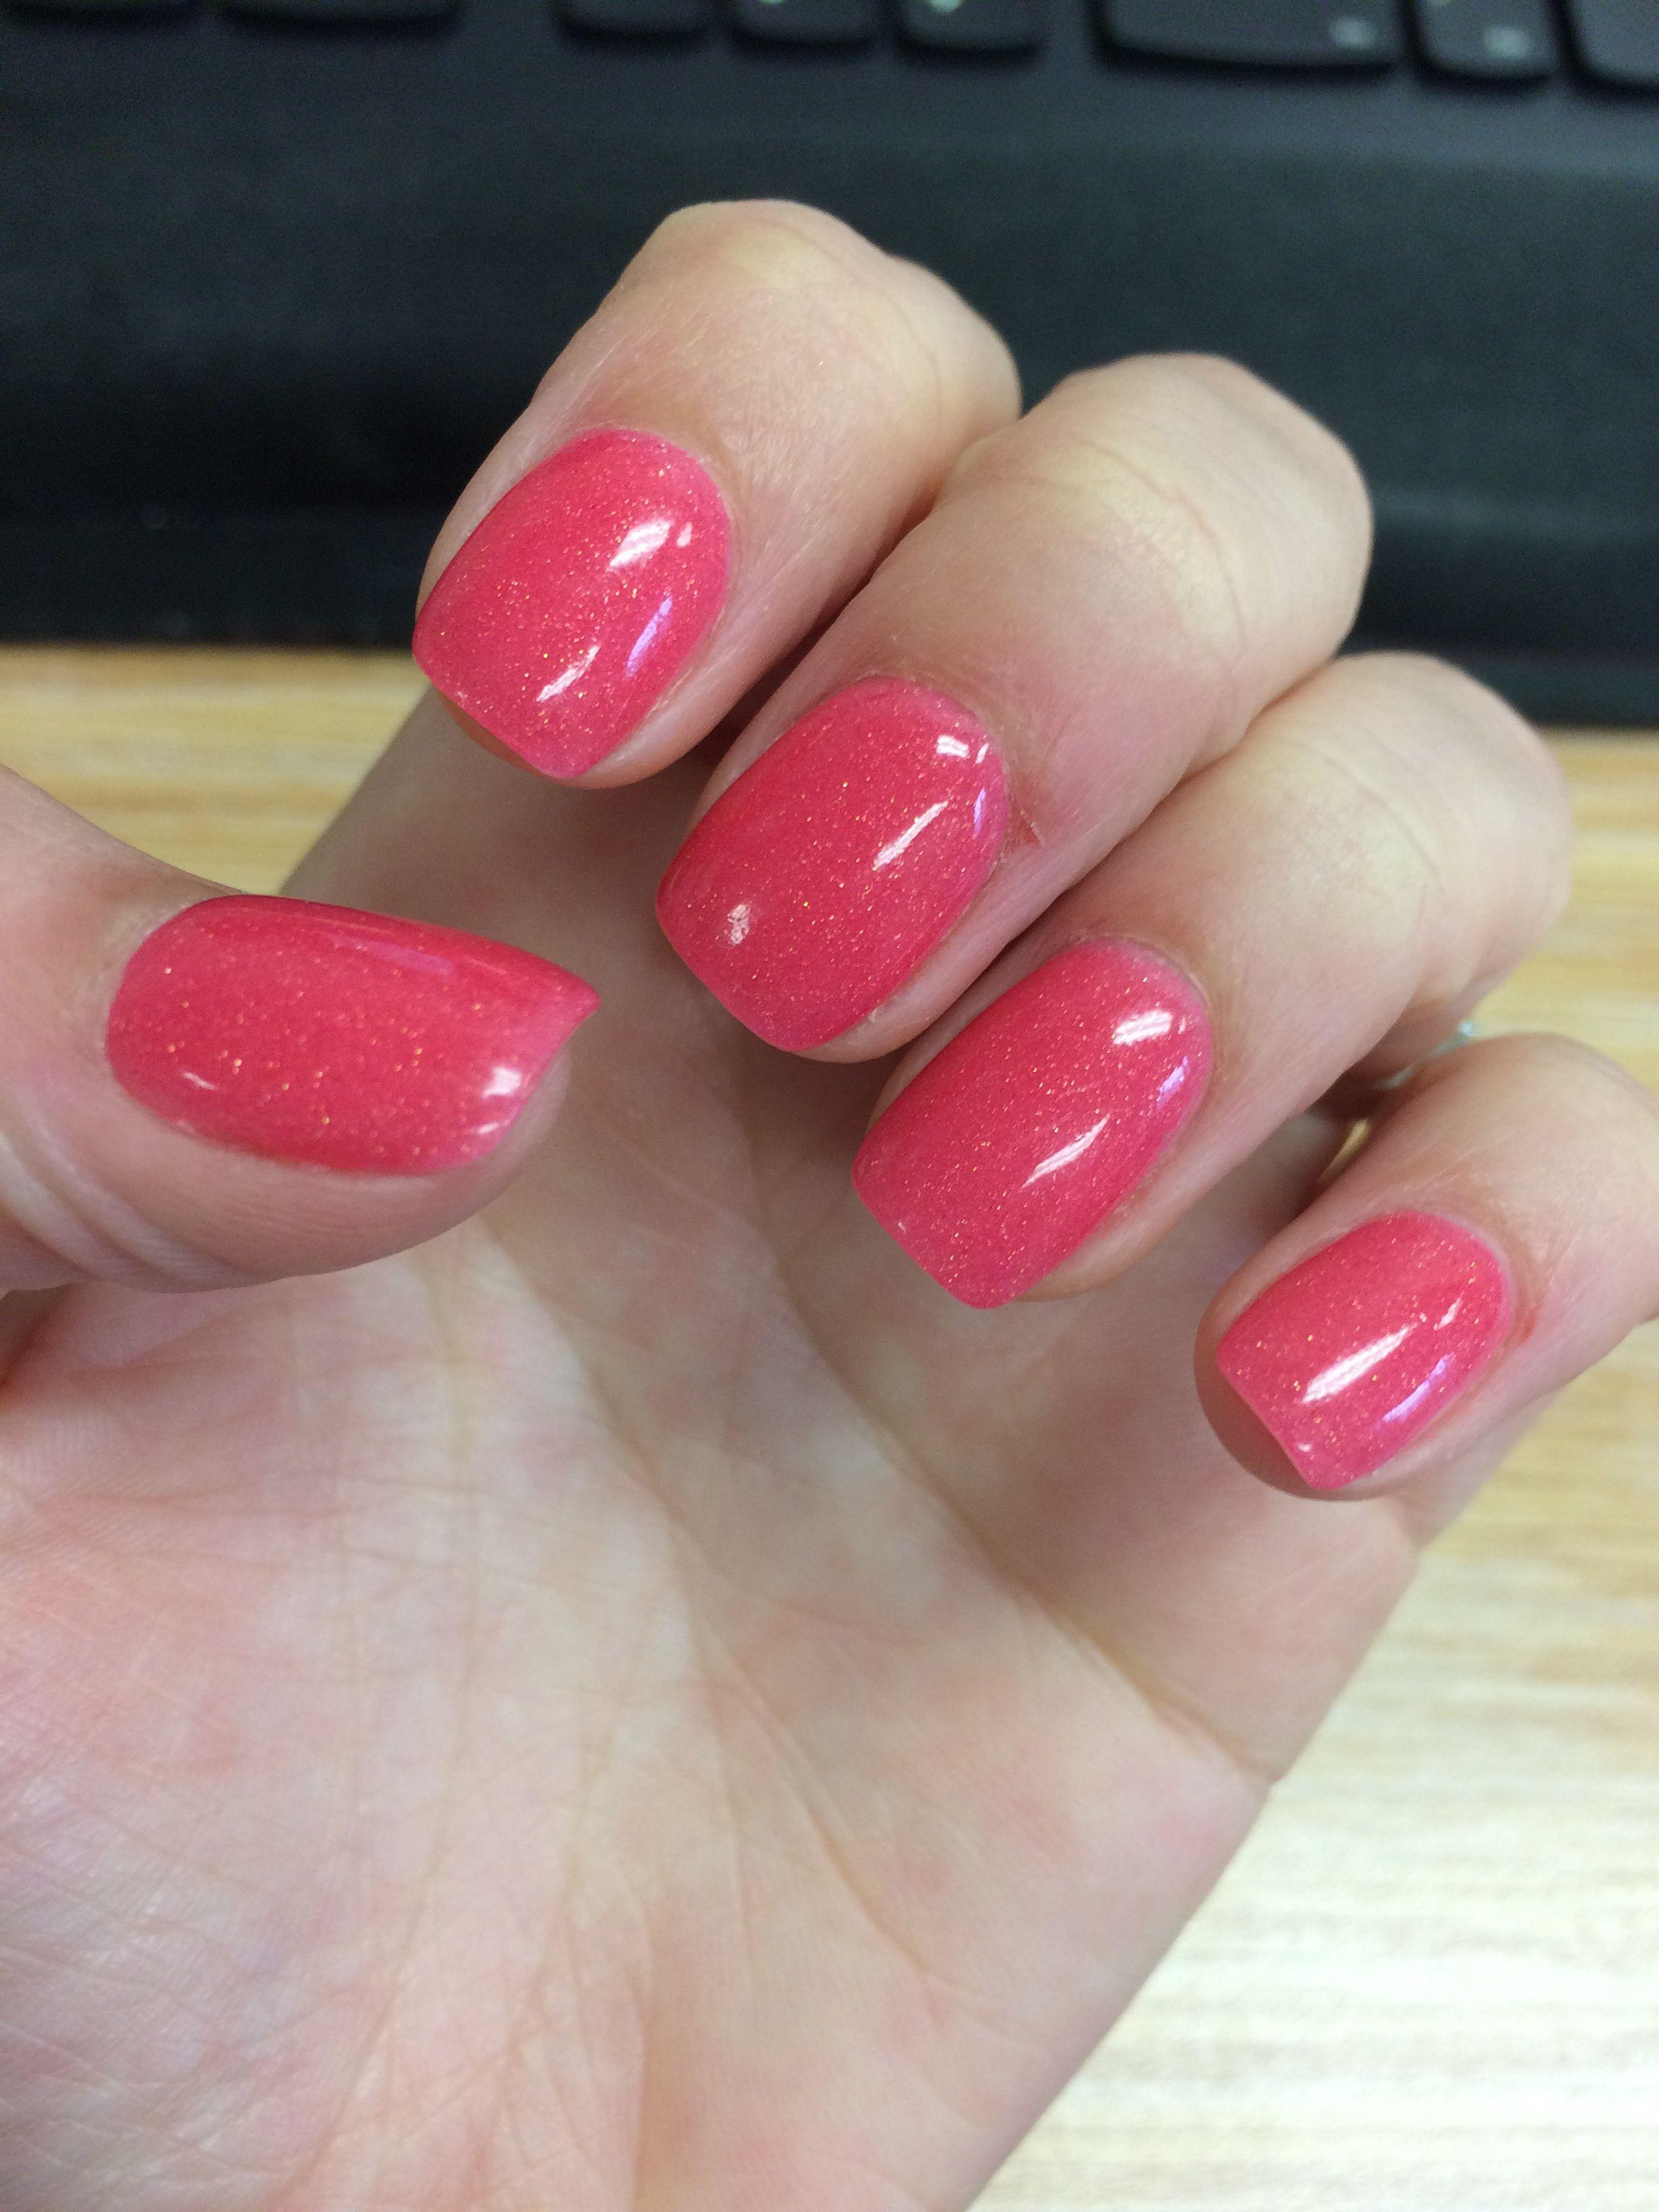 SNS nails   Sns nails colors, Sns nails, Nails